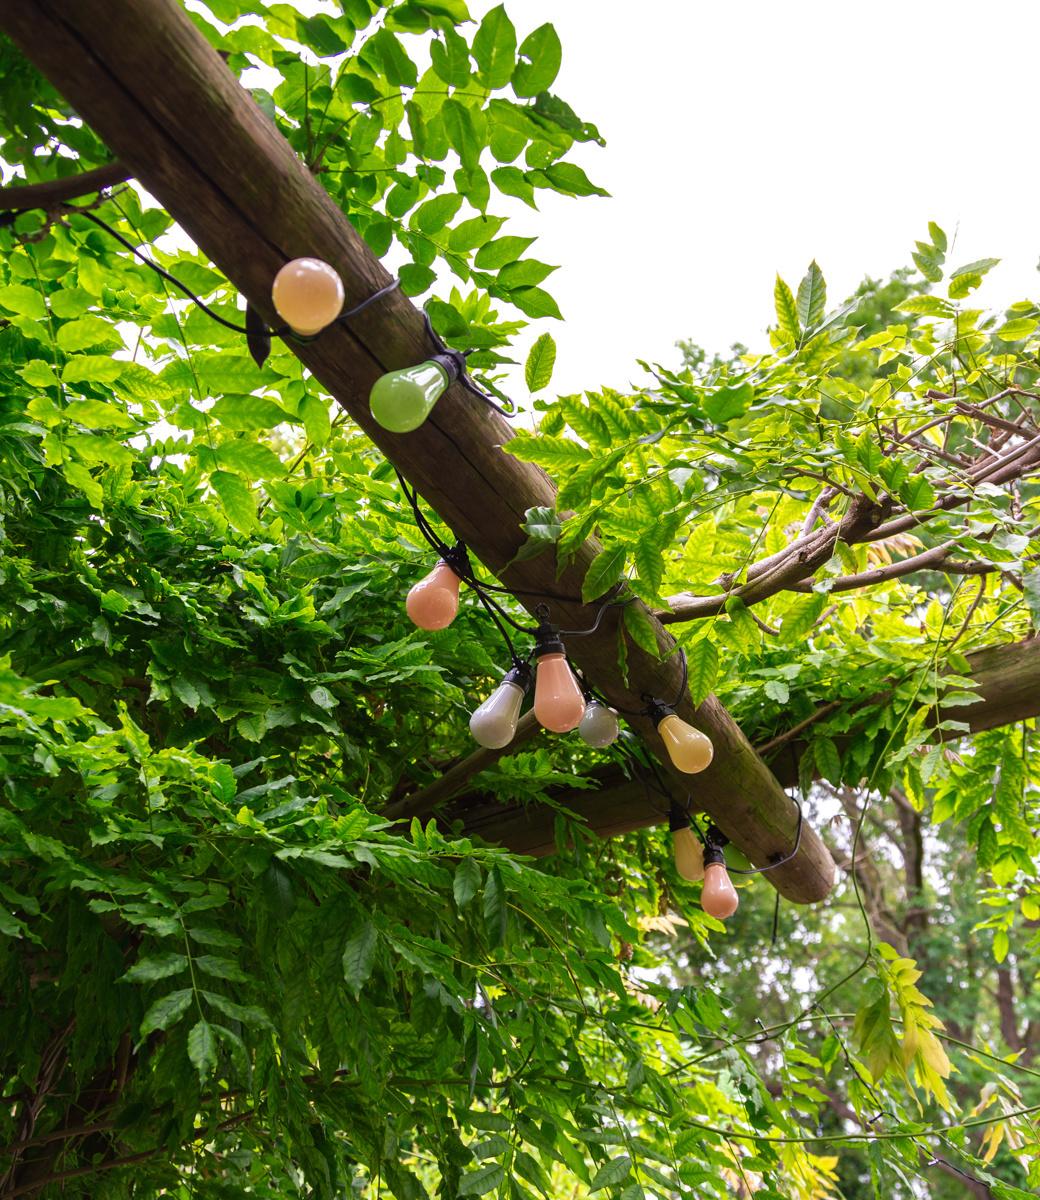 LEDR buiten feestverlichting groen en roze - Outdoor Patio Lichtslinger Paradise - 10 LED lampen - Edison Bulbs-2